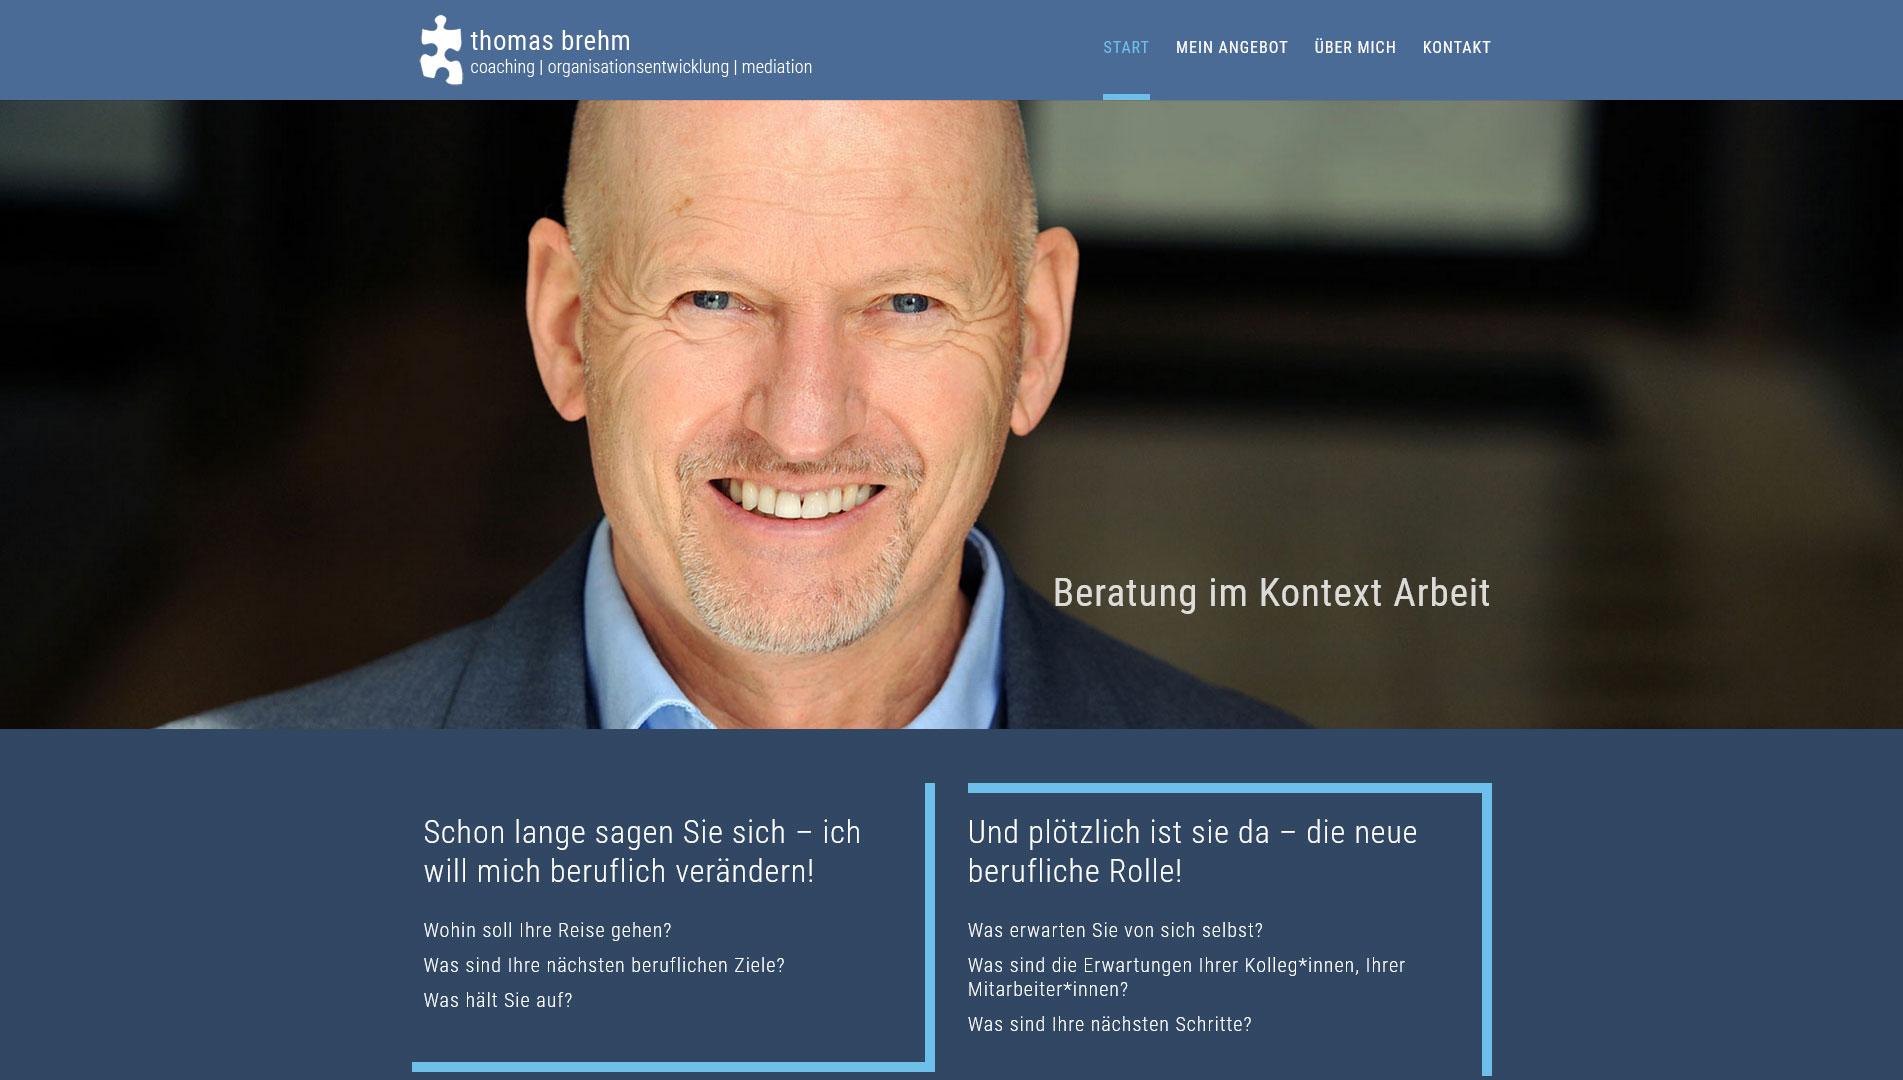 Thomas Brehm - Coaching | Organisationsentwicklung | Mediation